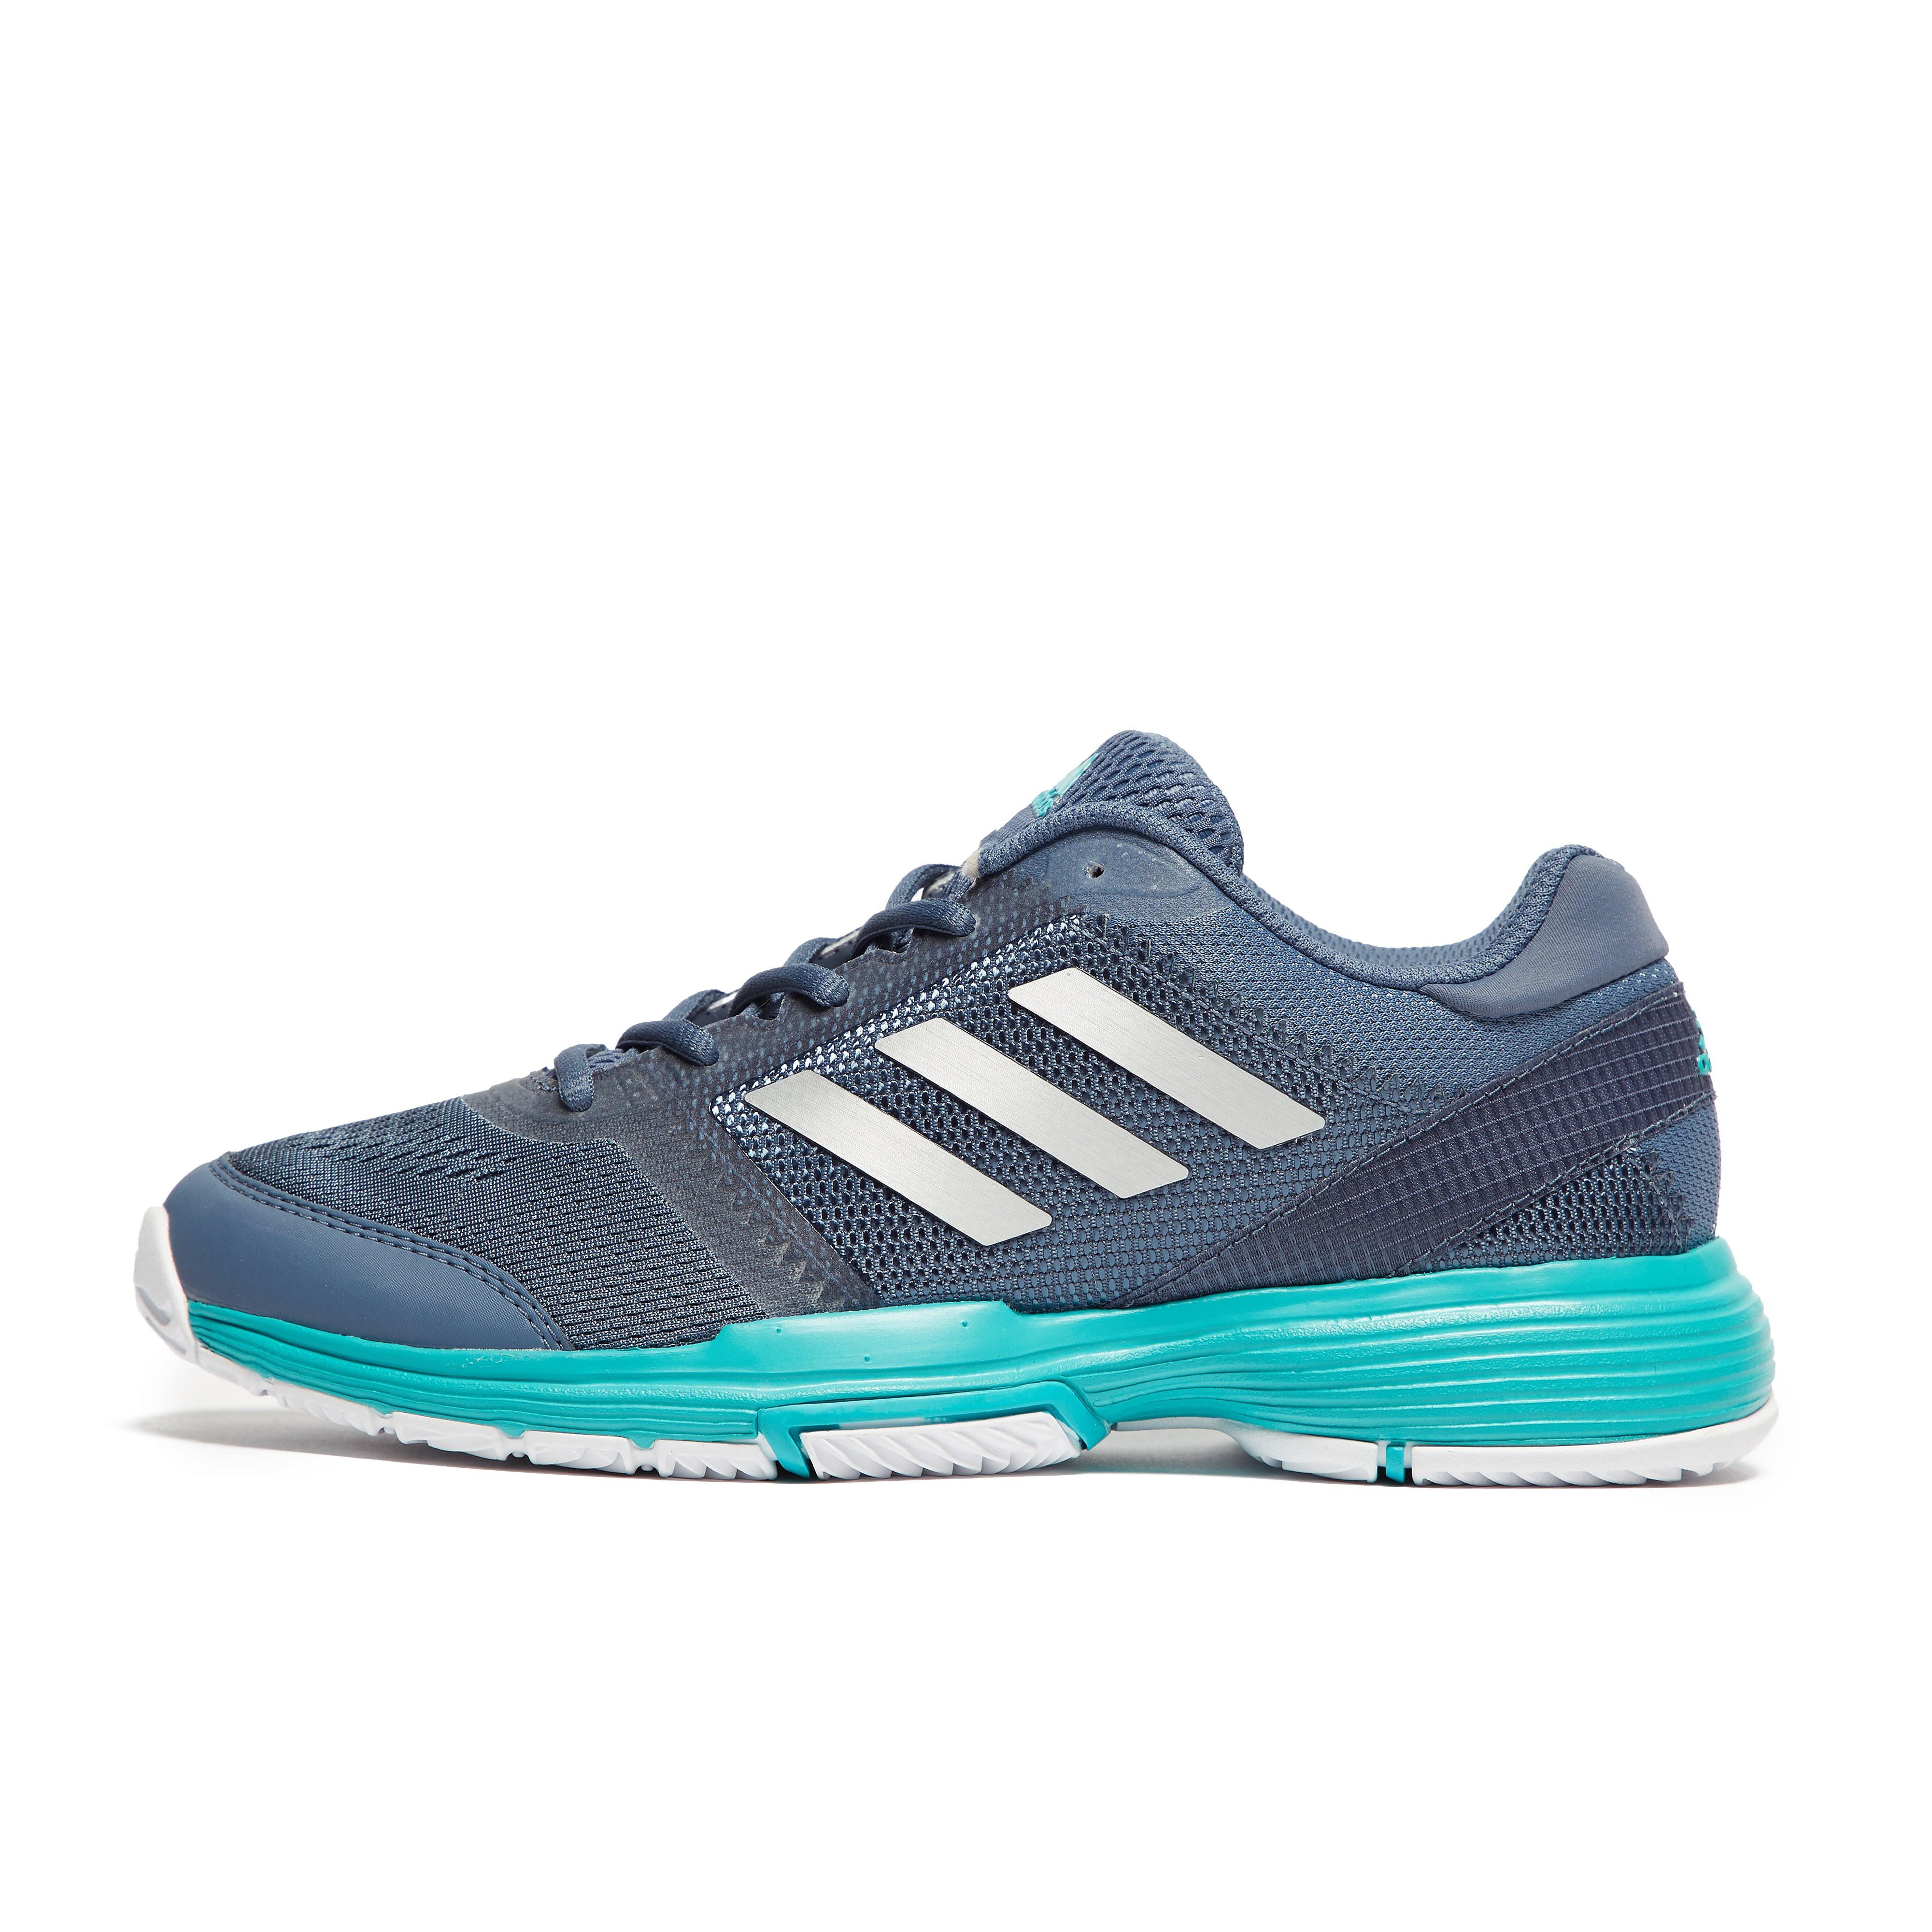 Le donne scarpe da tennis asic, k svizzero, adidas activinstinct